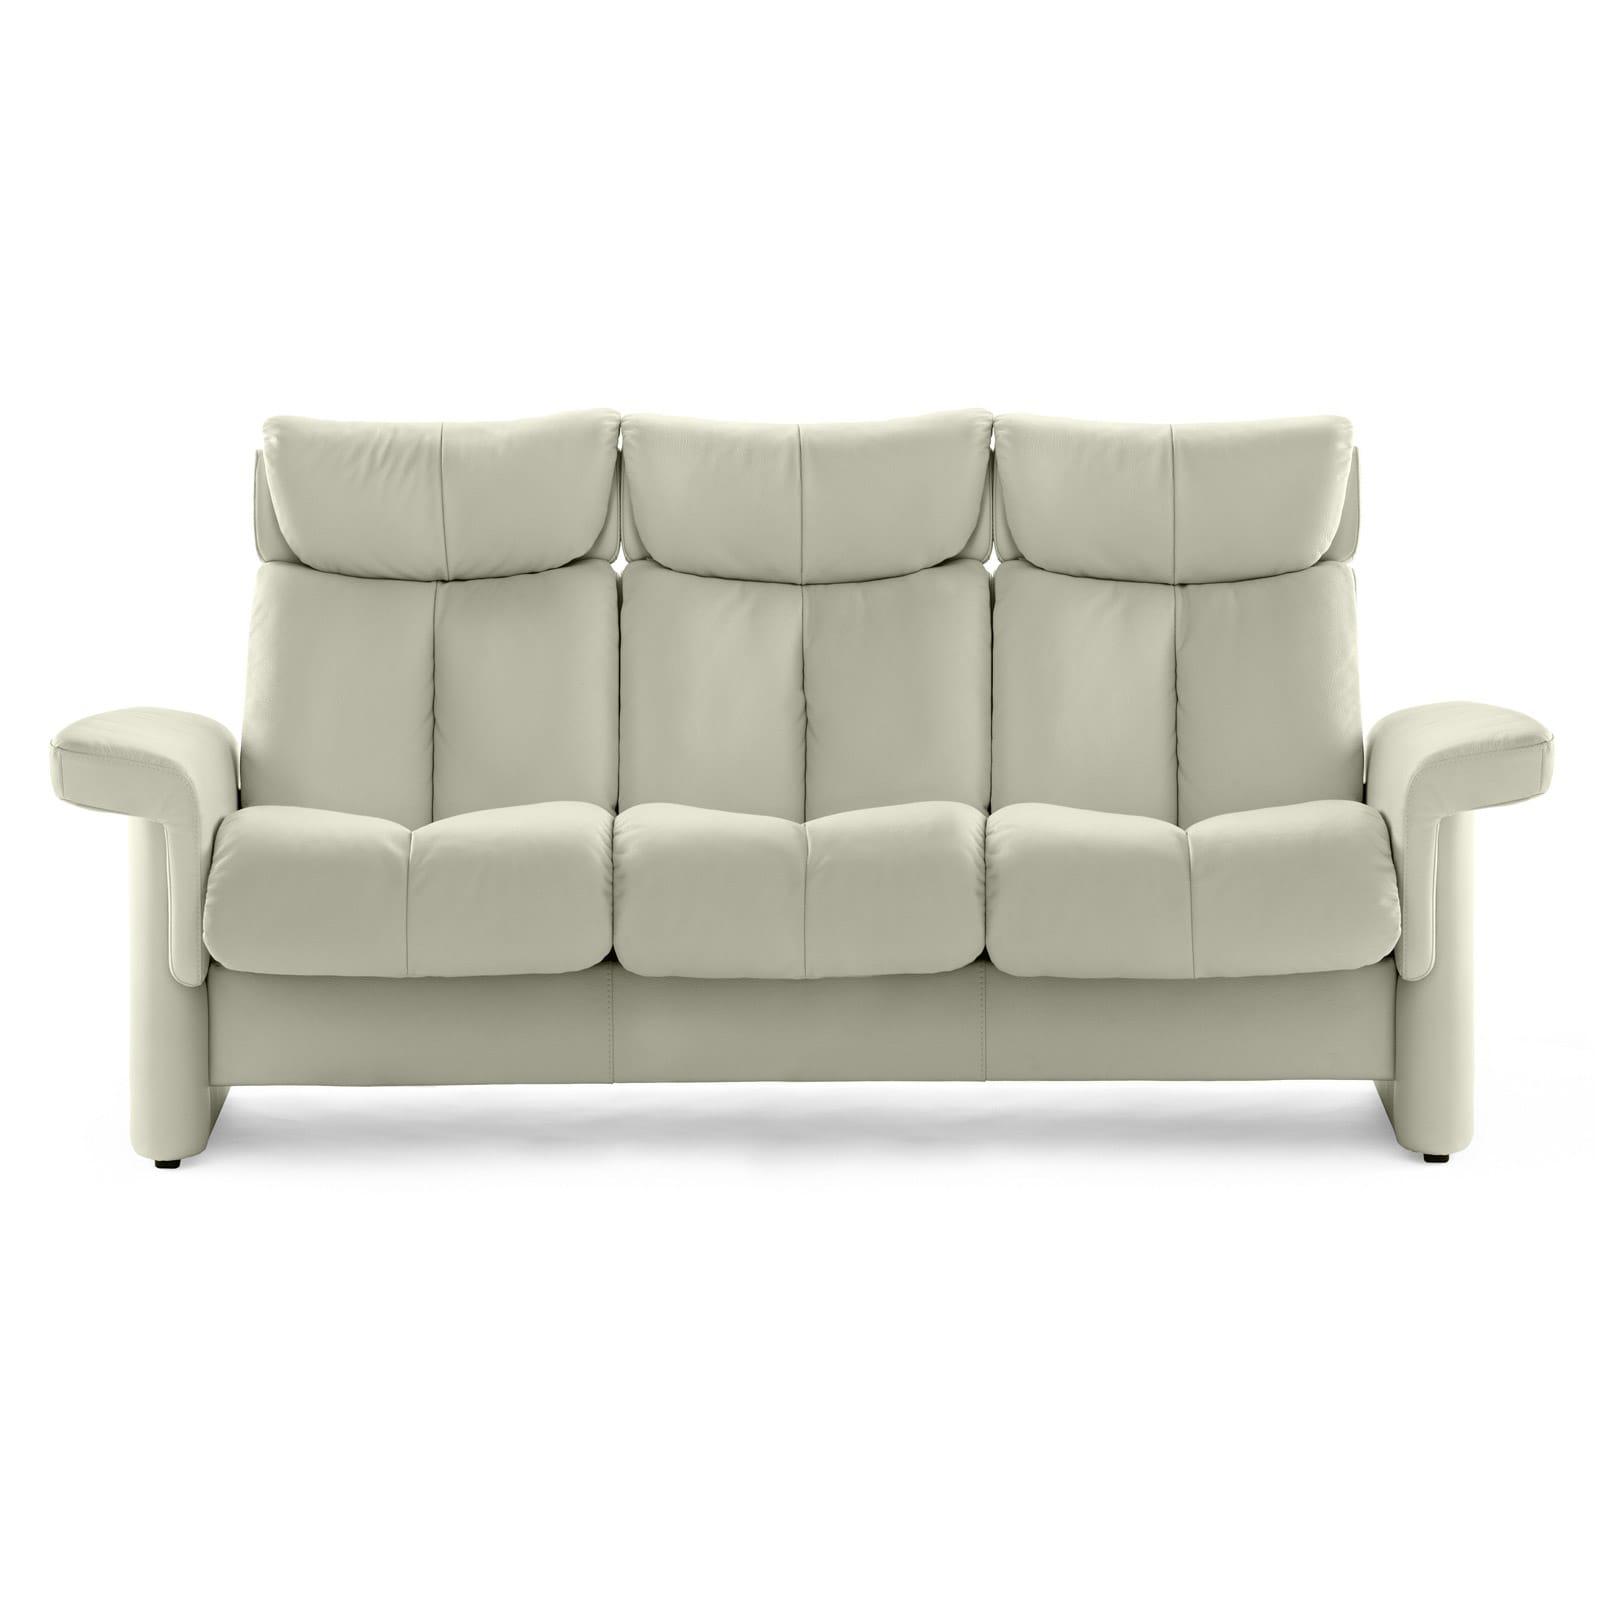 stressless sofa 3 sitzer legend m hoch paloma light grey. Black Bedroom Furniture Sets. Home Design Ideas